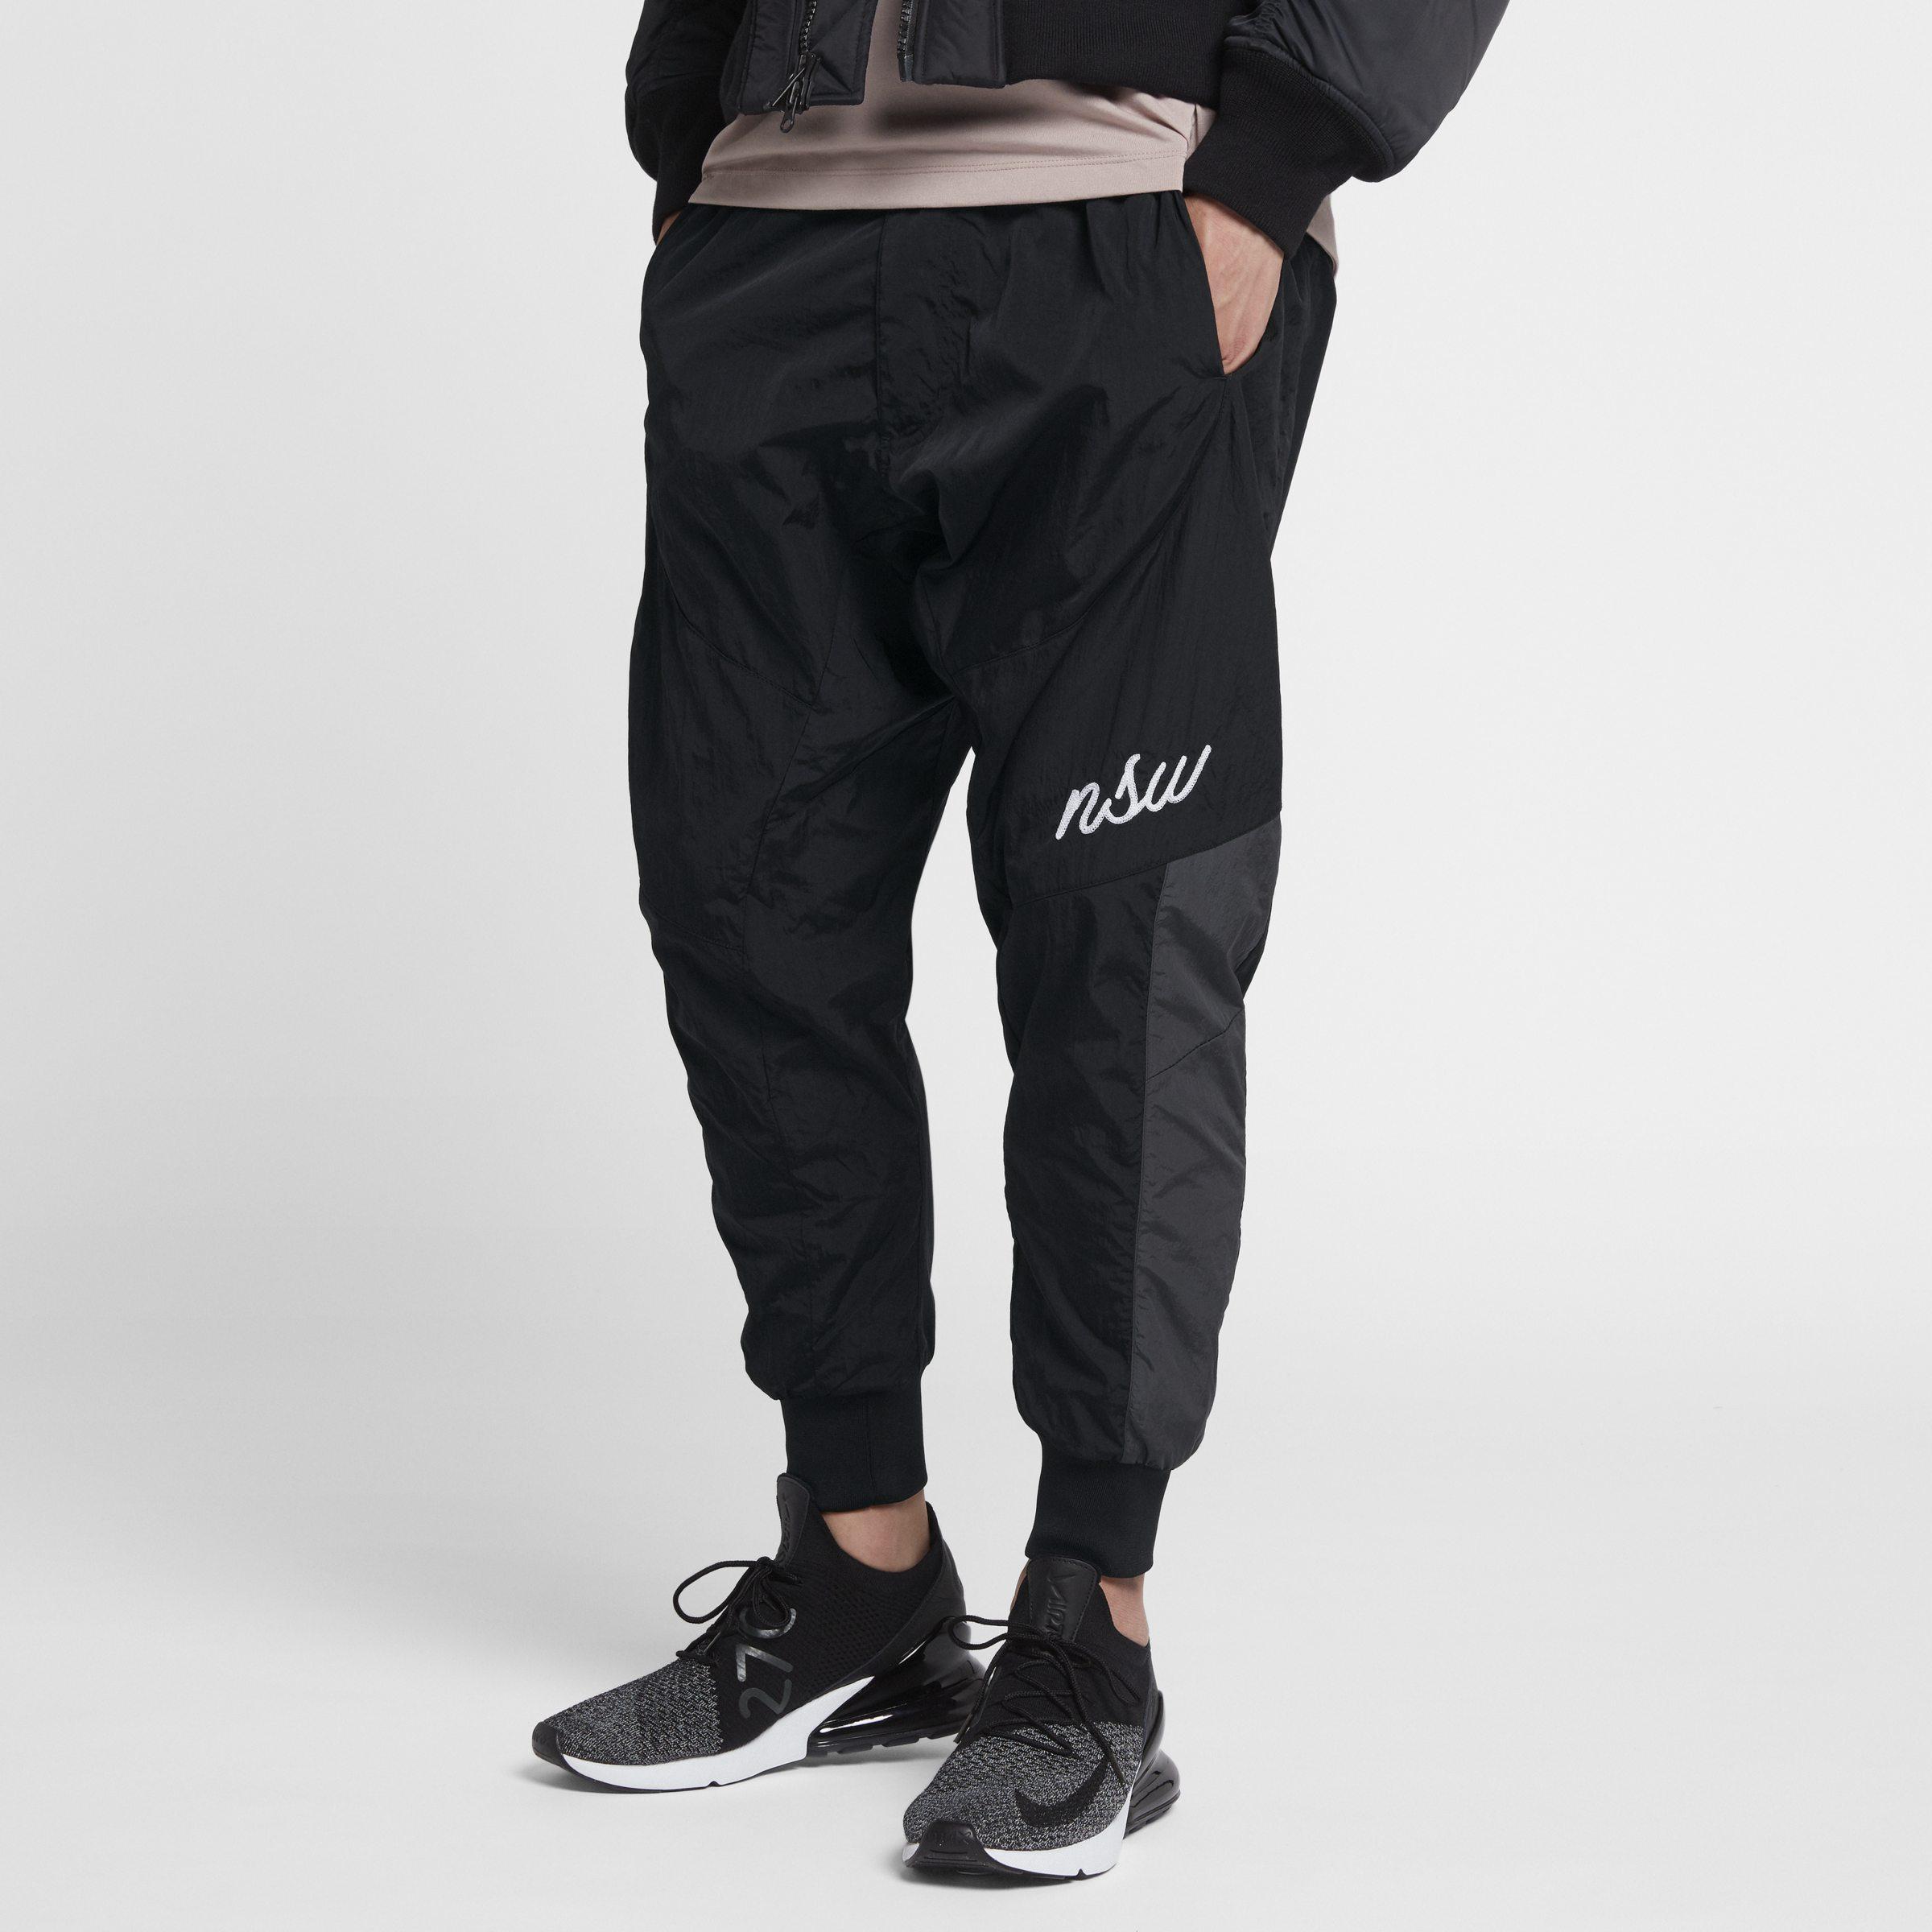 7b4cc4bad28509 Lyst - Nike Sportswear NSW Herren-Jogger aus Webmaterial in Schwarz ...